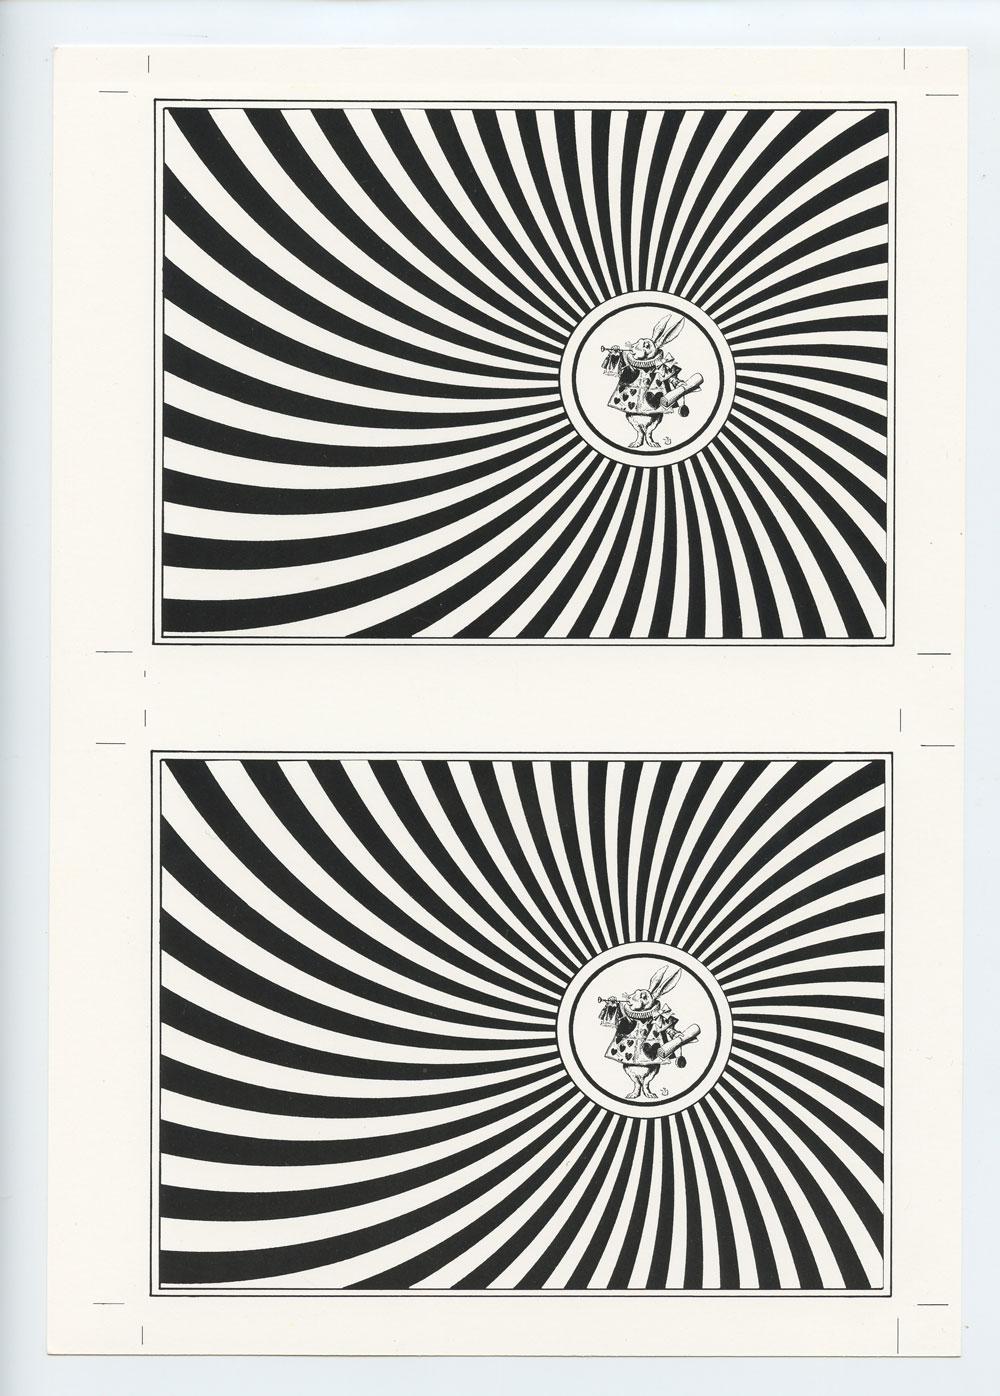 Blotter Acid Art Exihibit Reception Postcard Uncut Through The Looking Glass 1992 ARTROCK